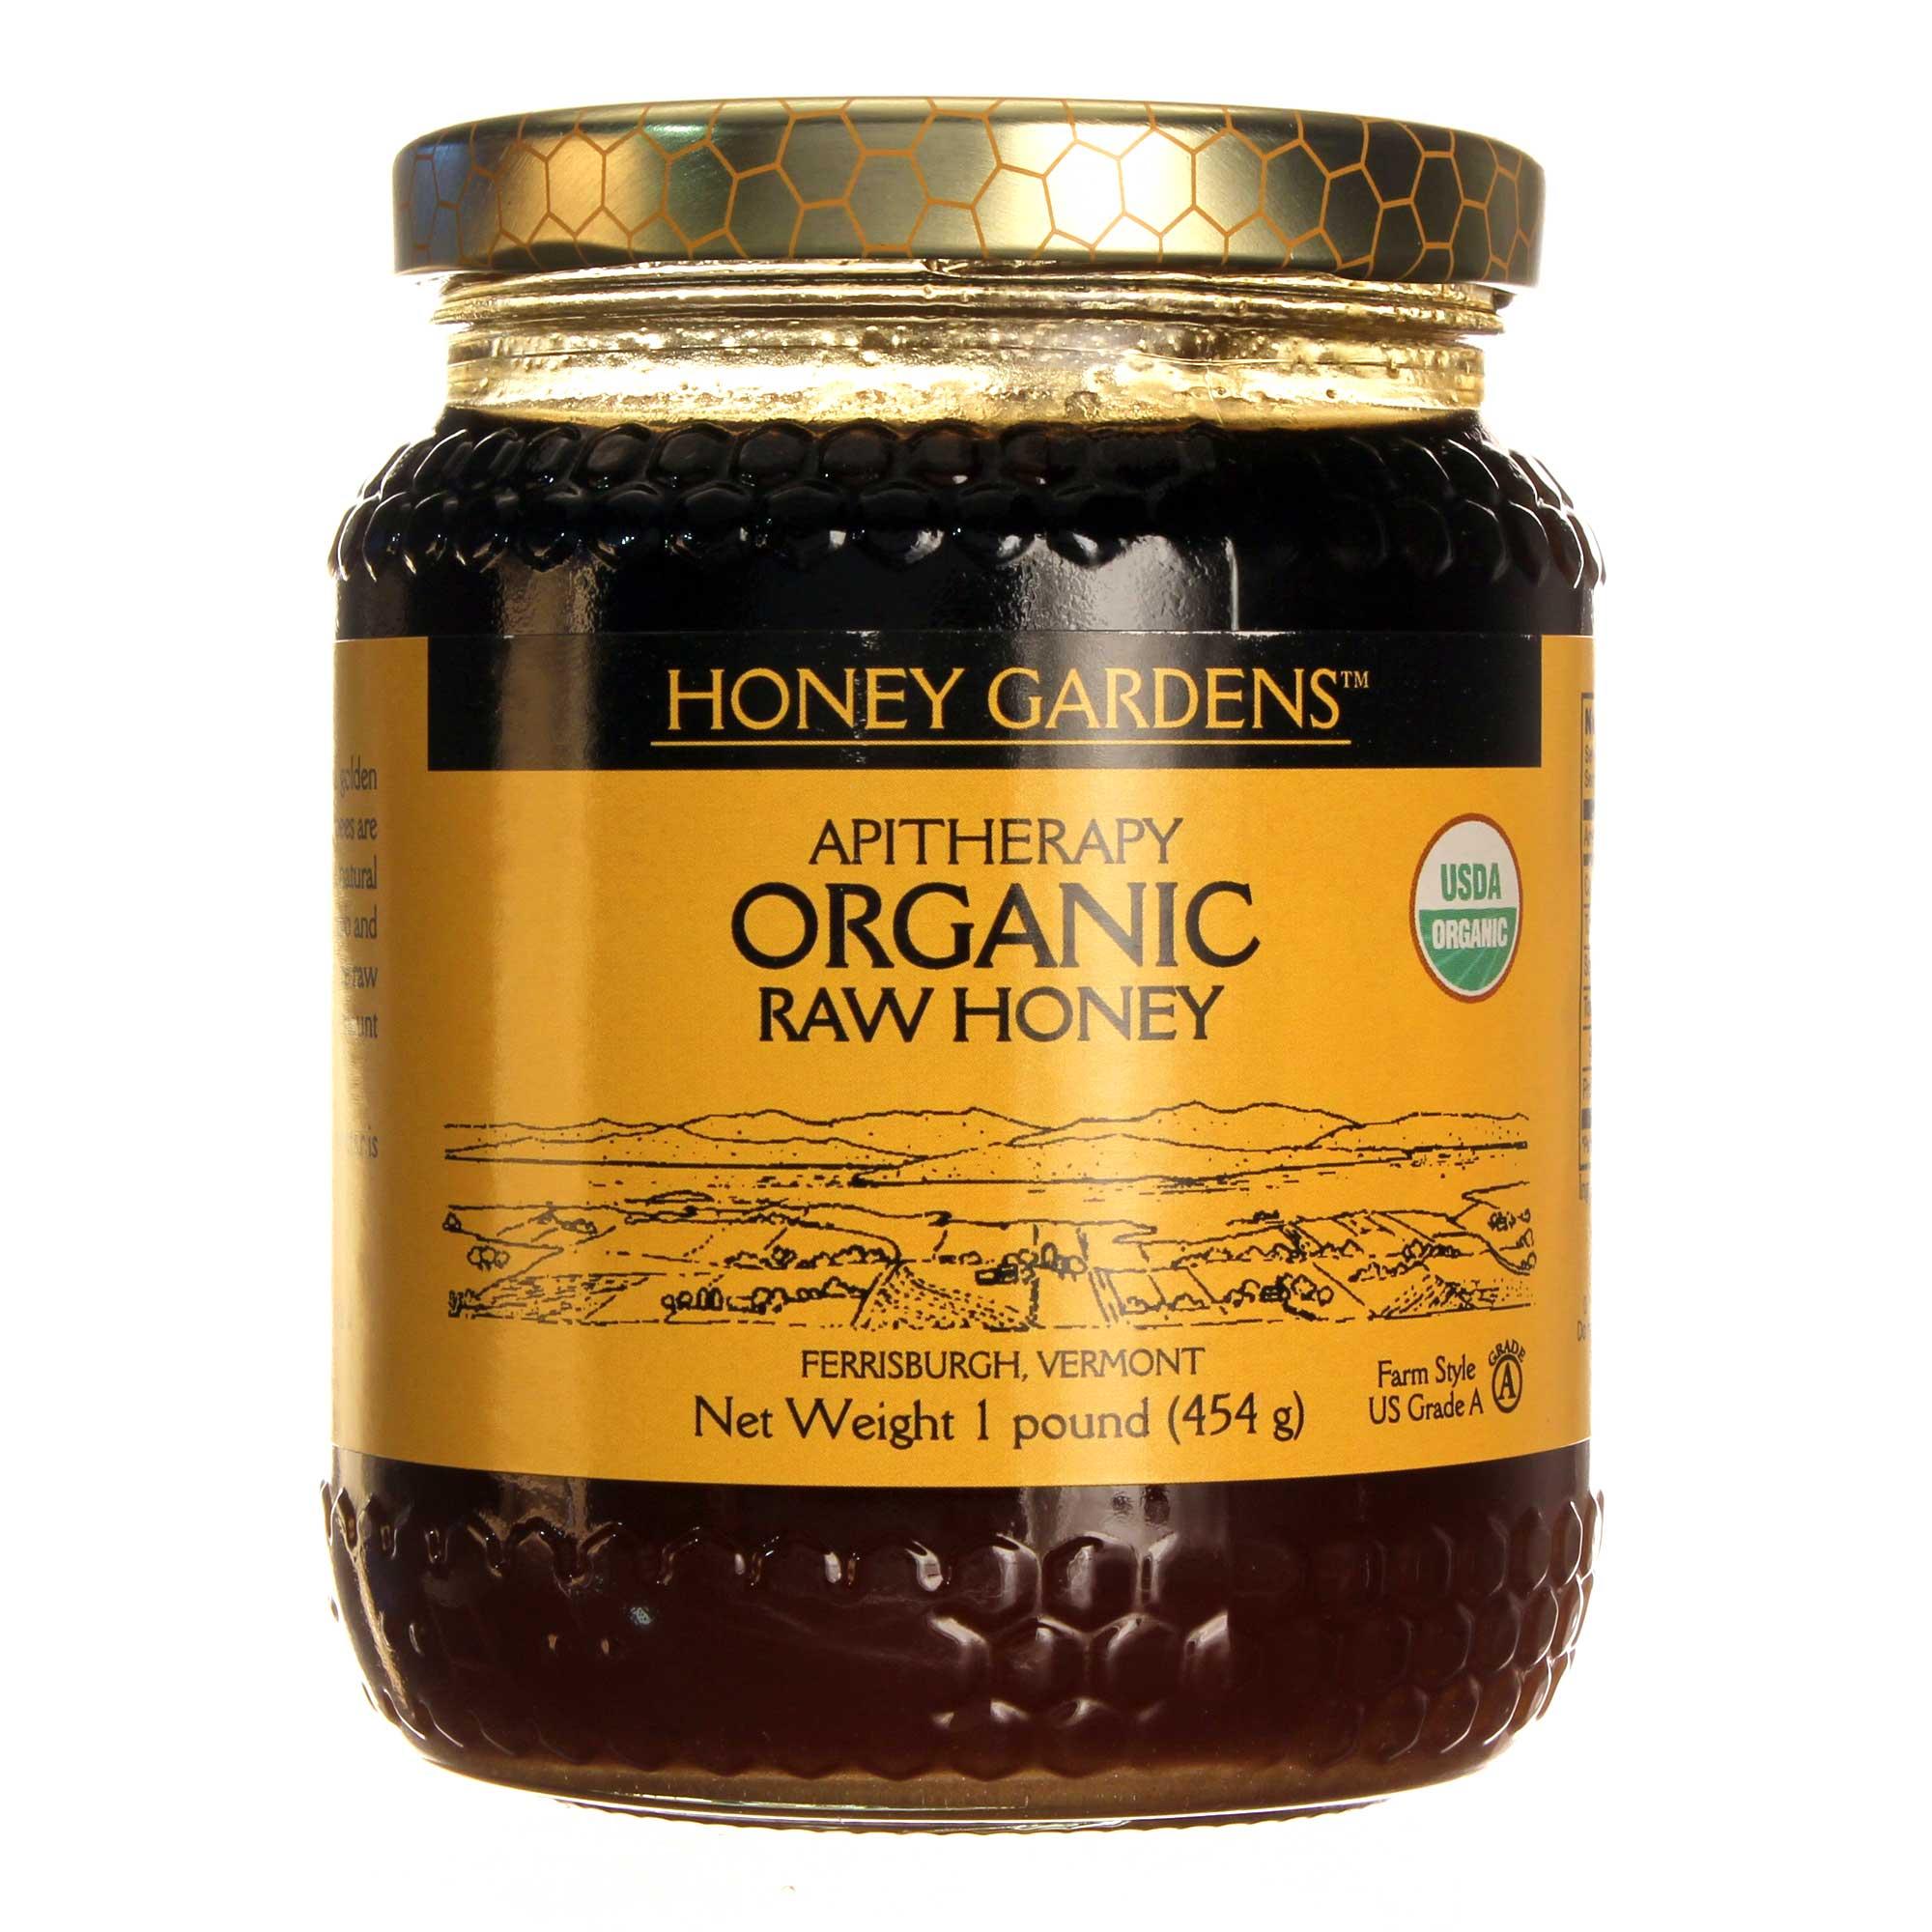 Honey Gardens Organic Raw Honey - 1 lb